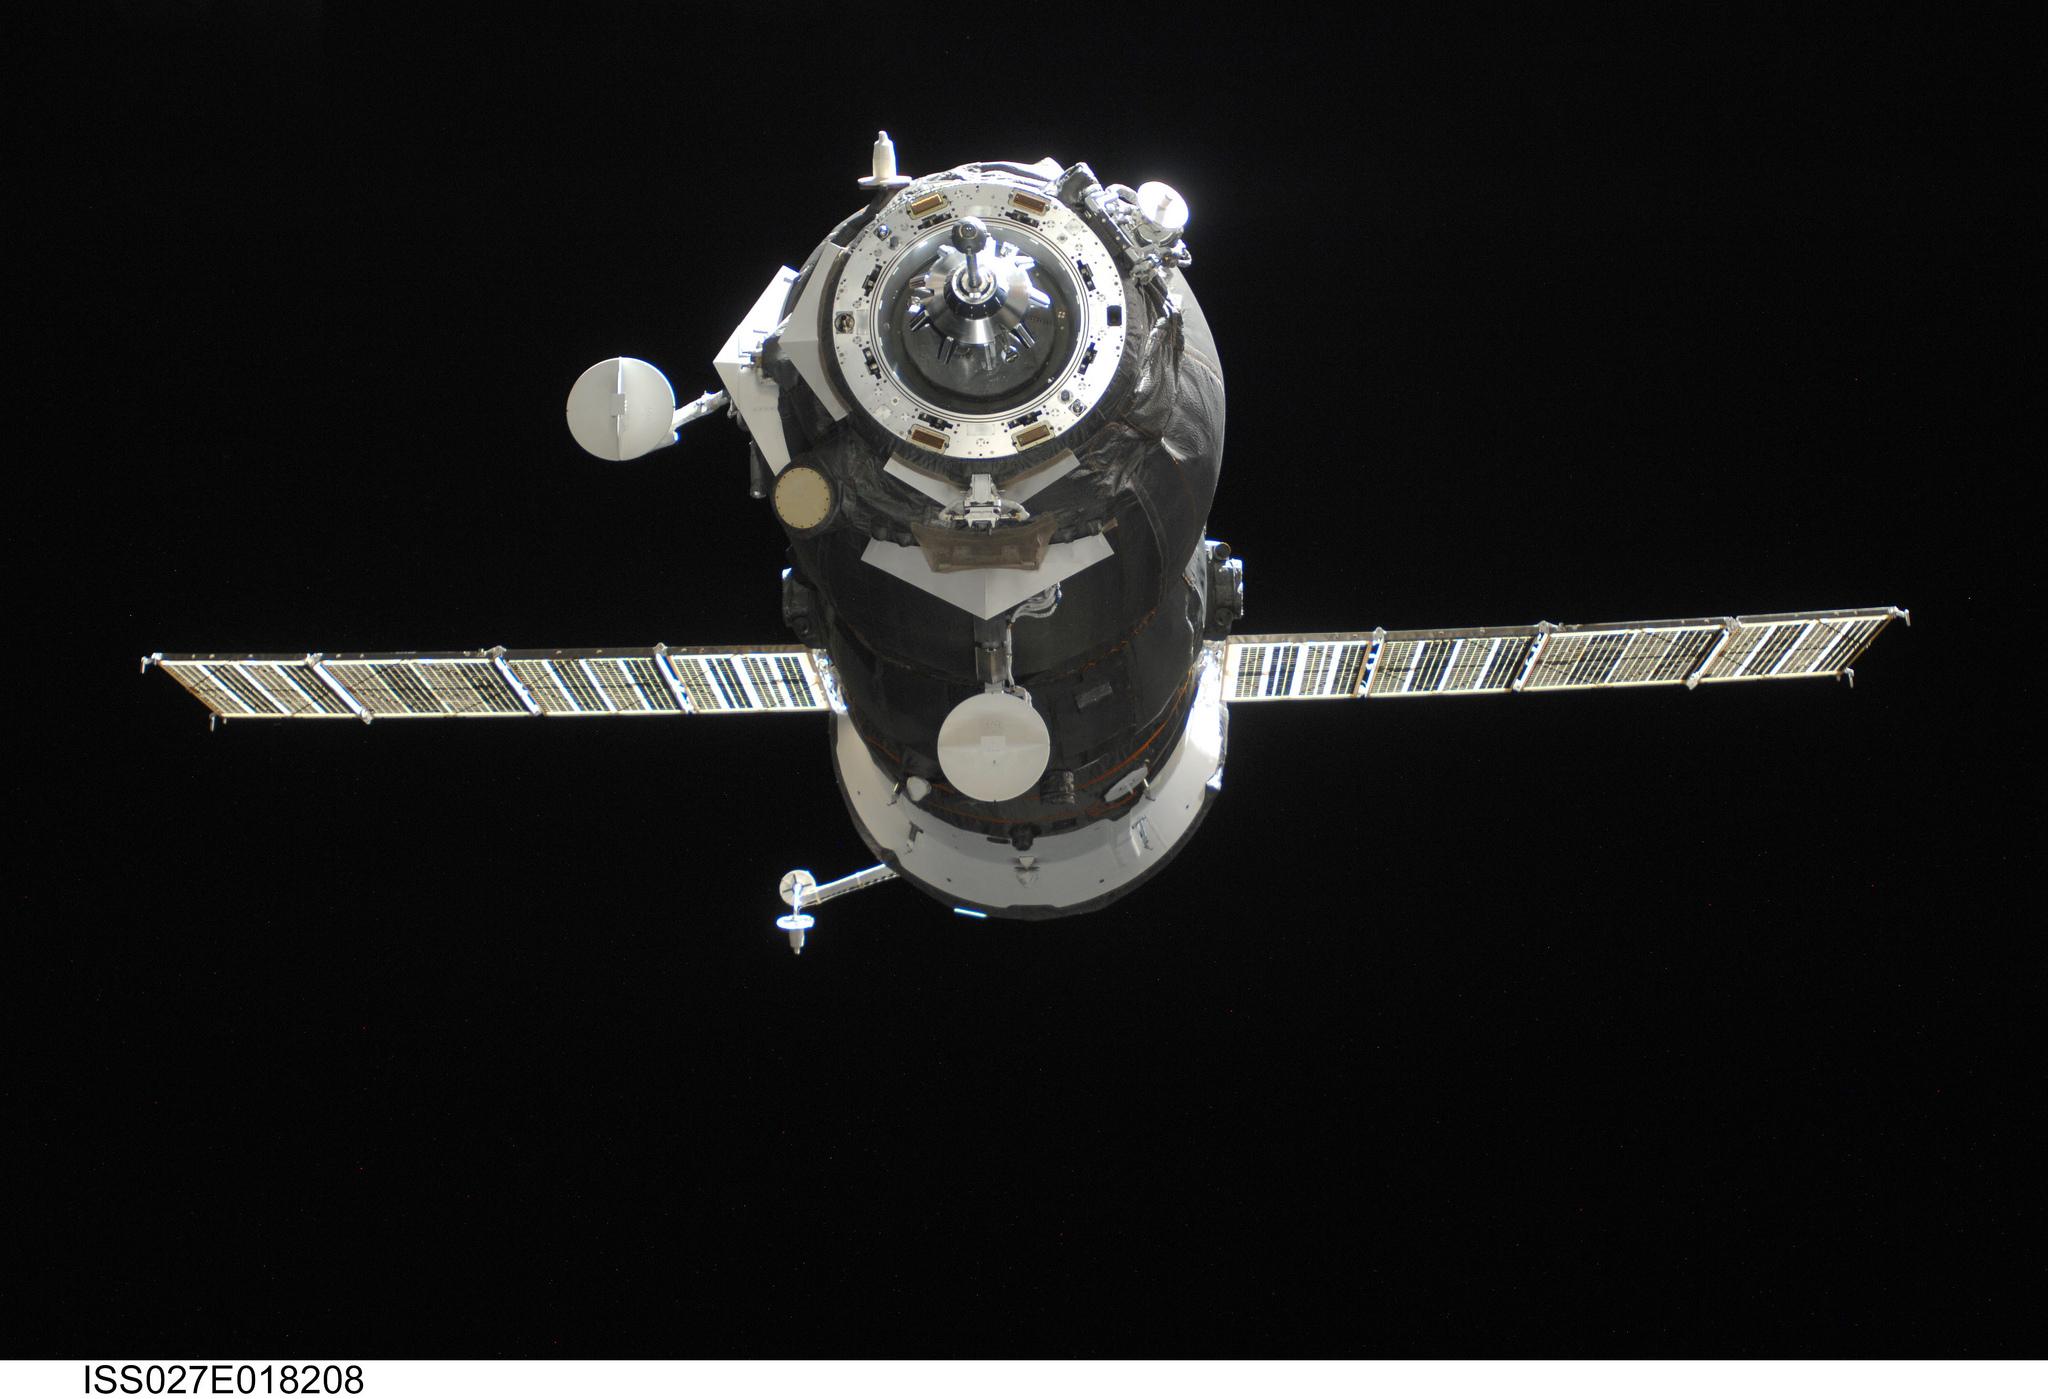 ISS Progress resupply vehicle